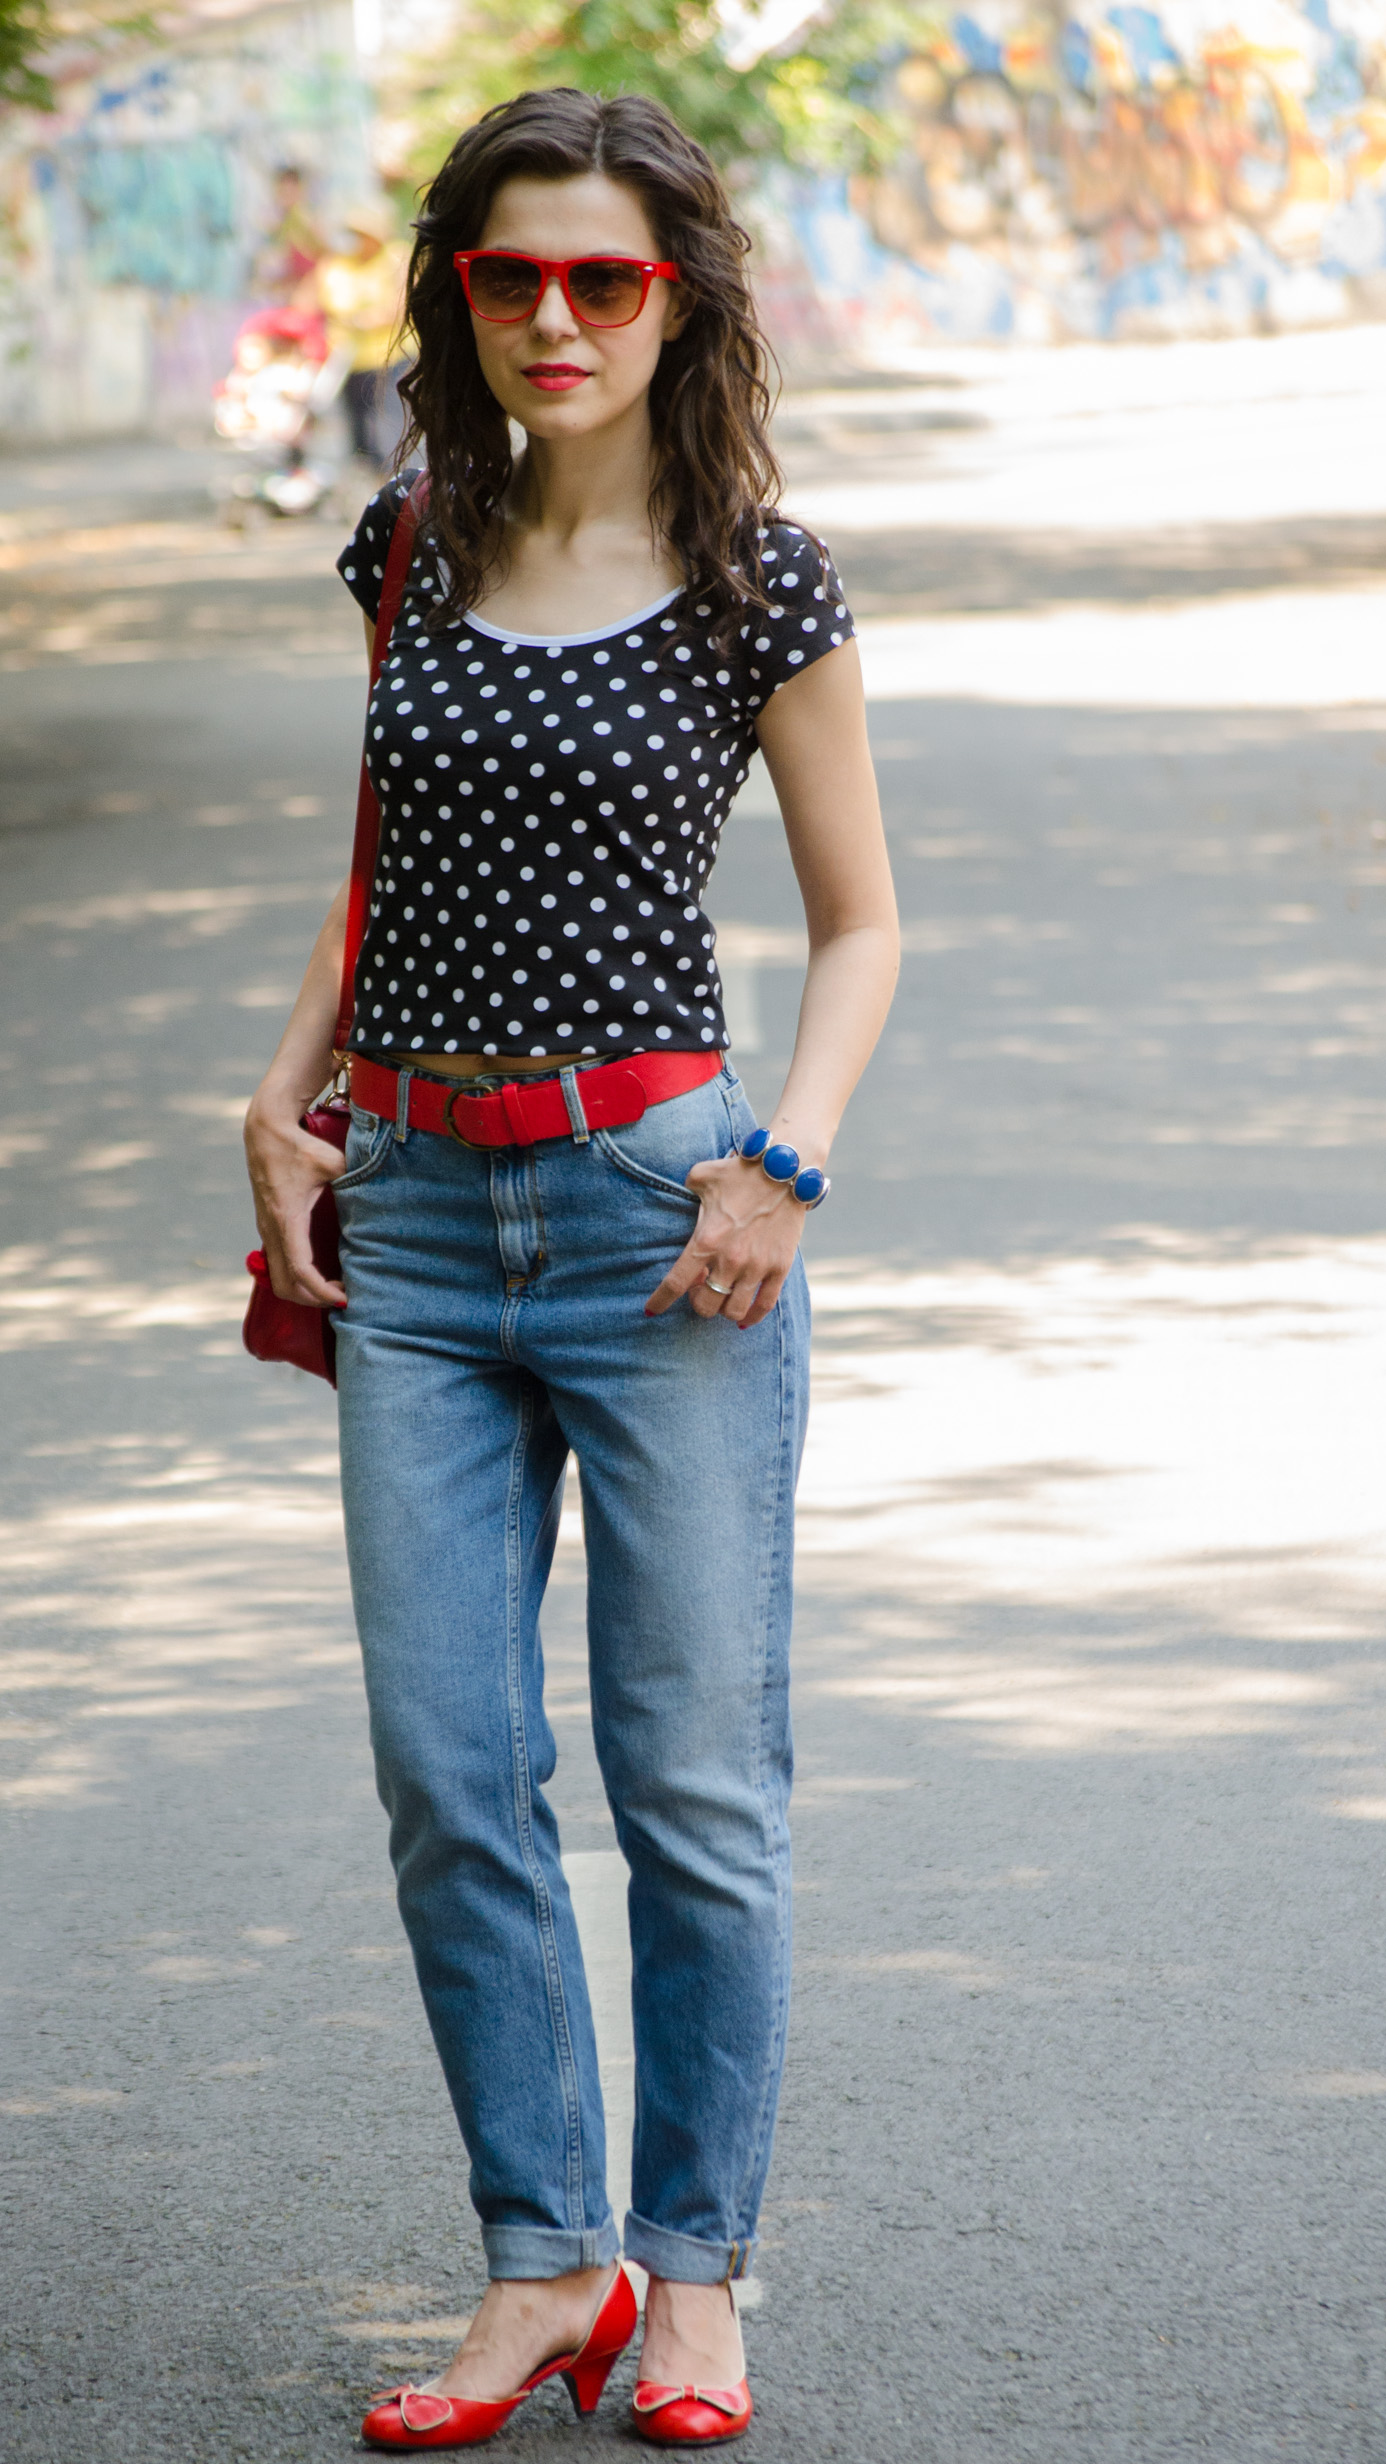 urban retro mom jeans h&m dots black red poema promod graffiti